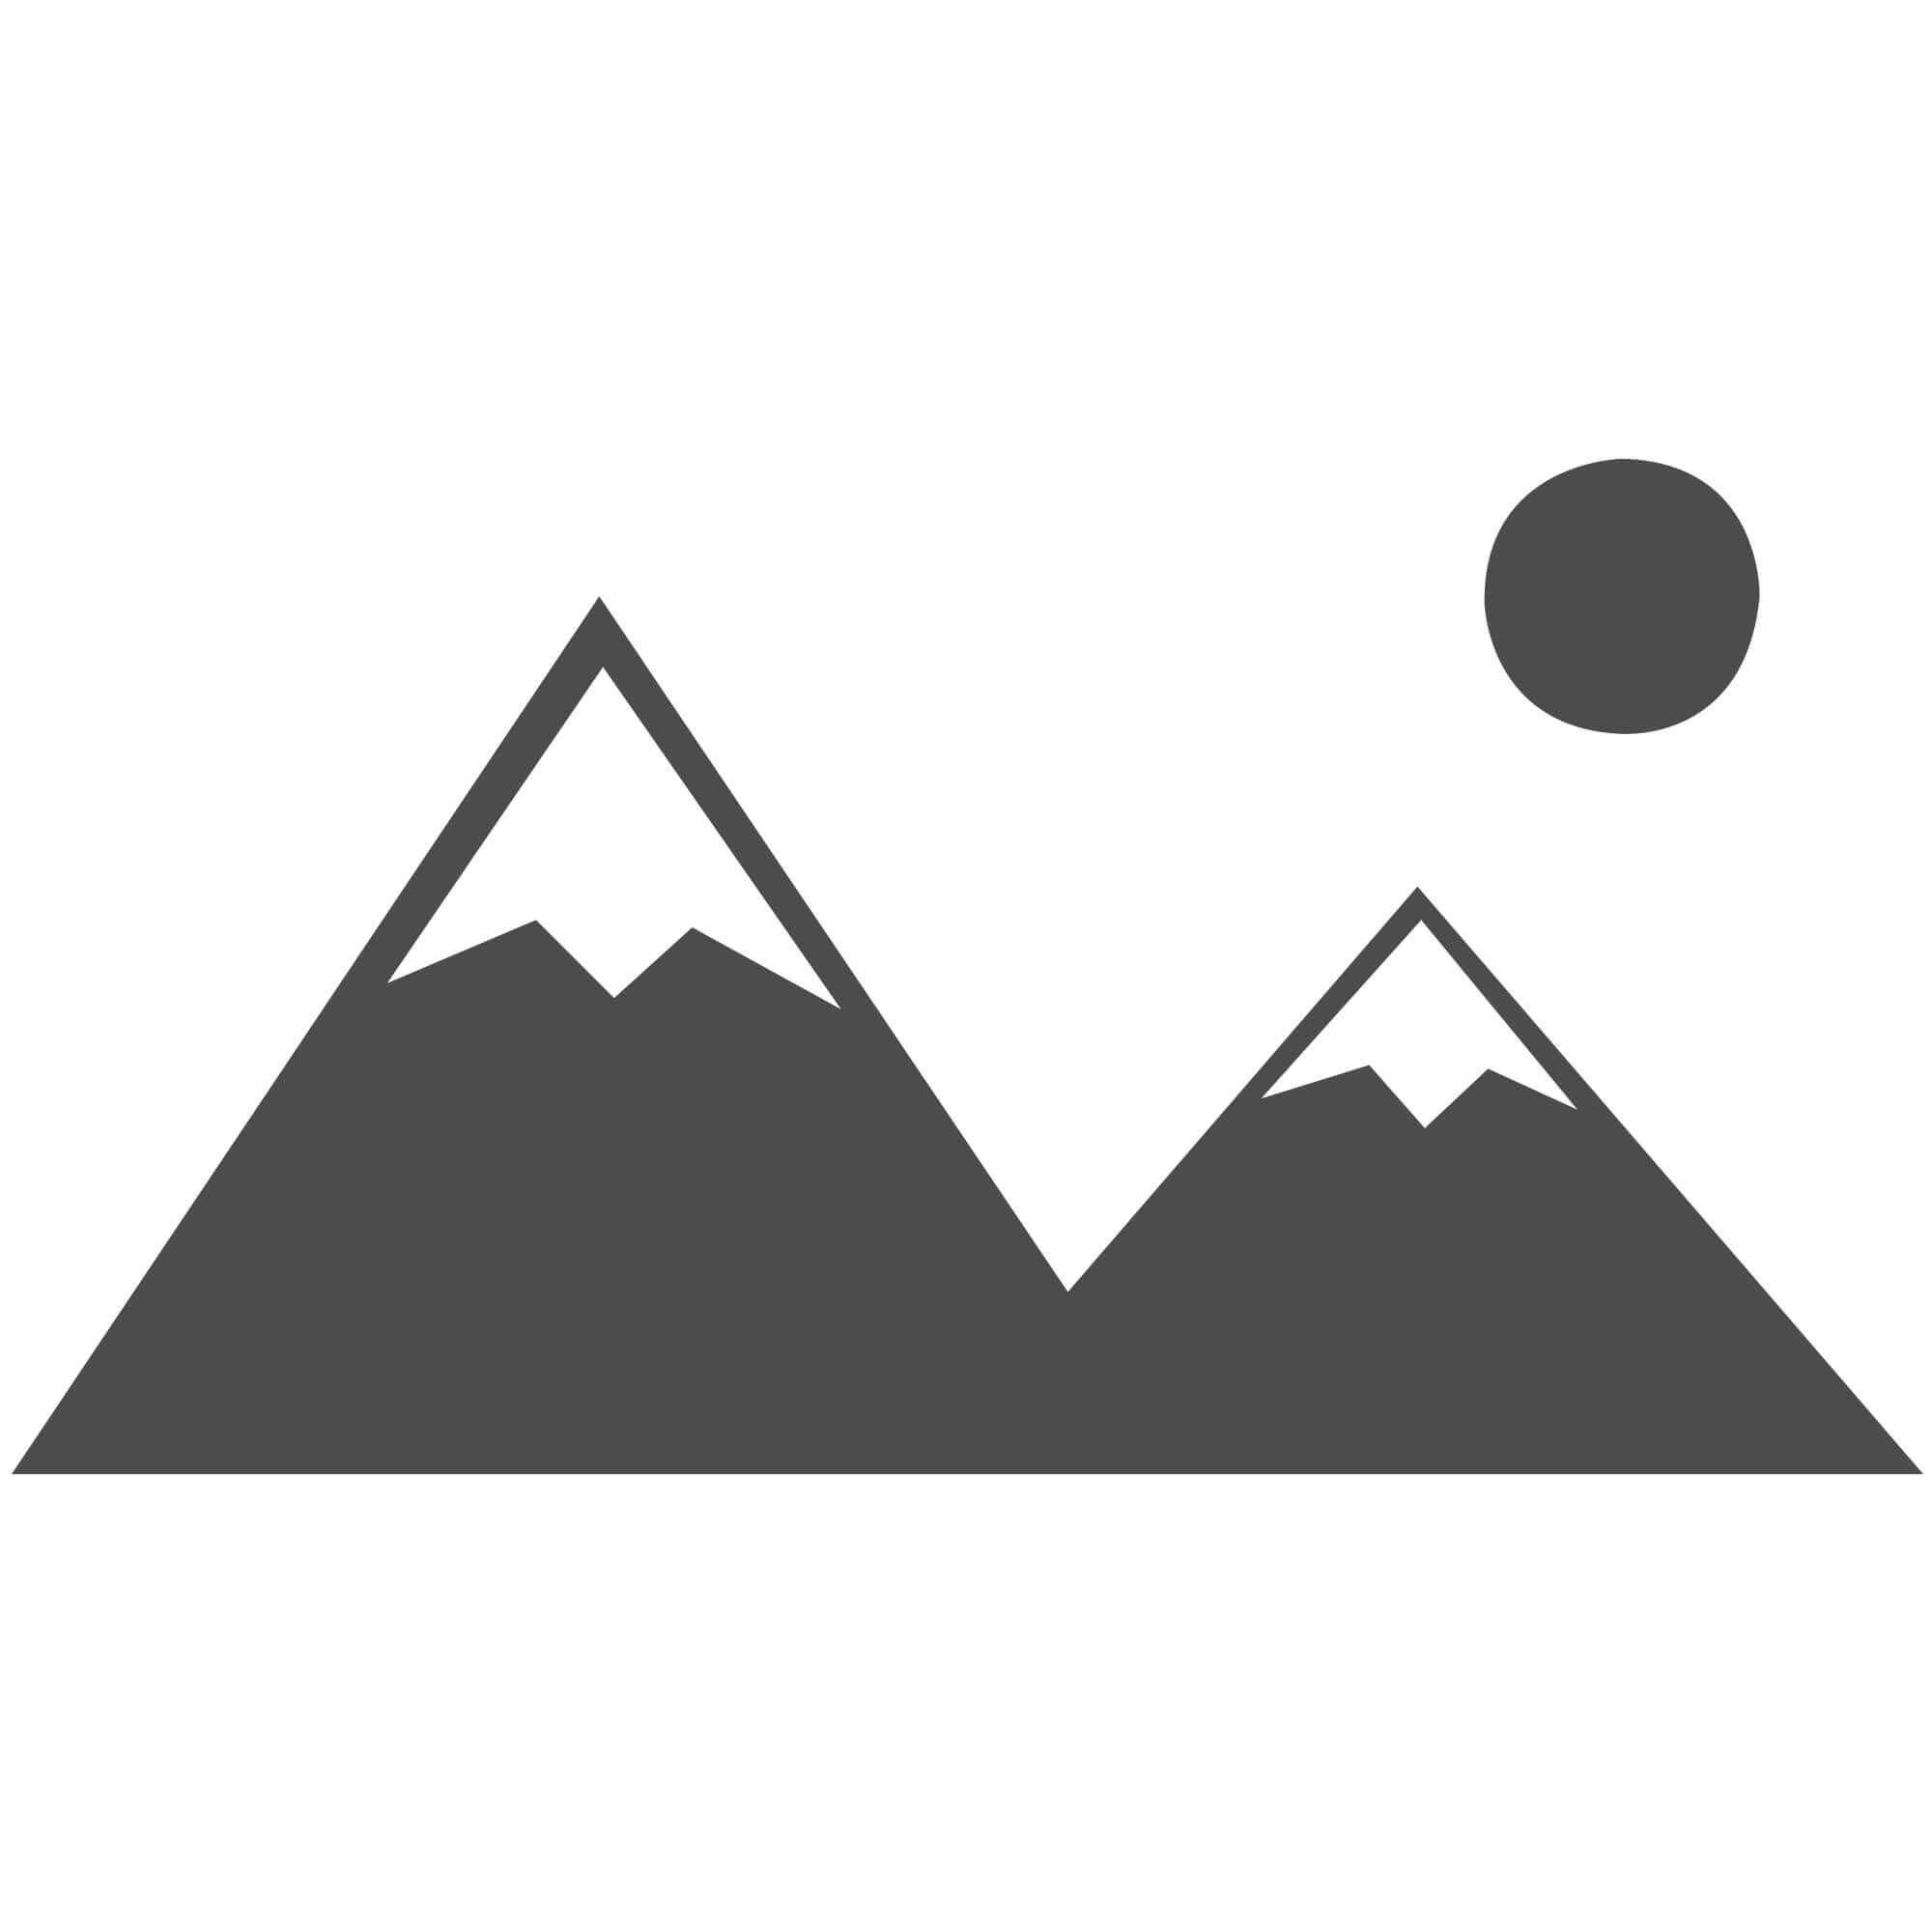 "Verge Honeycomb Grey Duck Egg Rug - Size 80 x 150 cm (2'8"" x 5')"